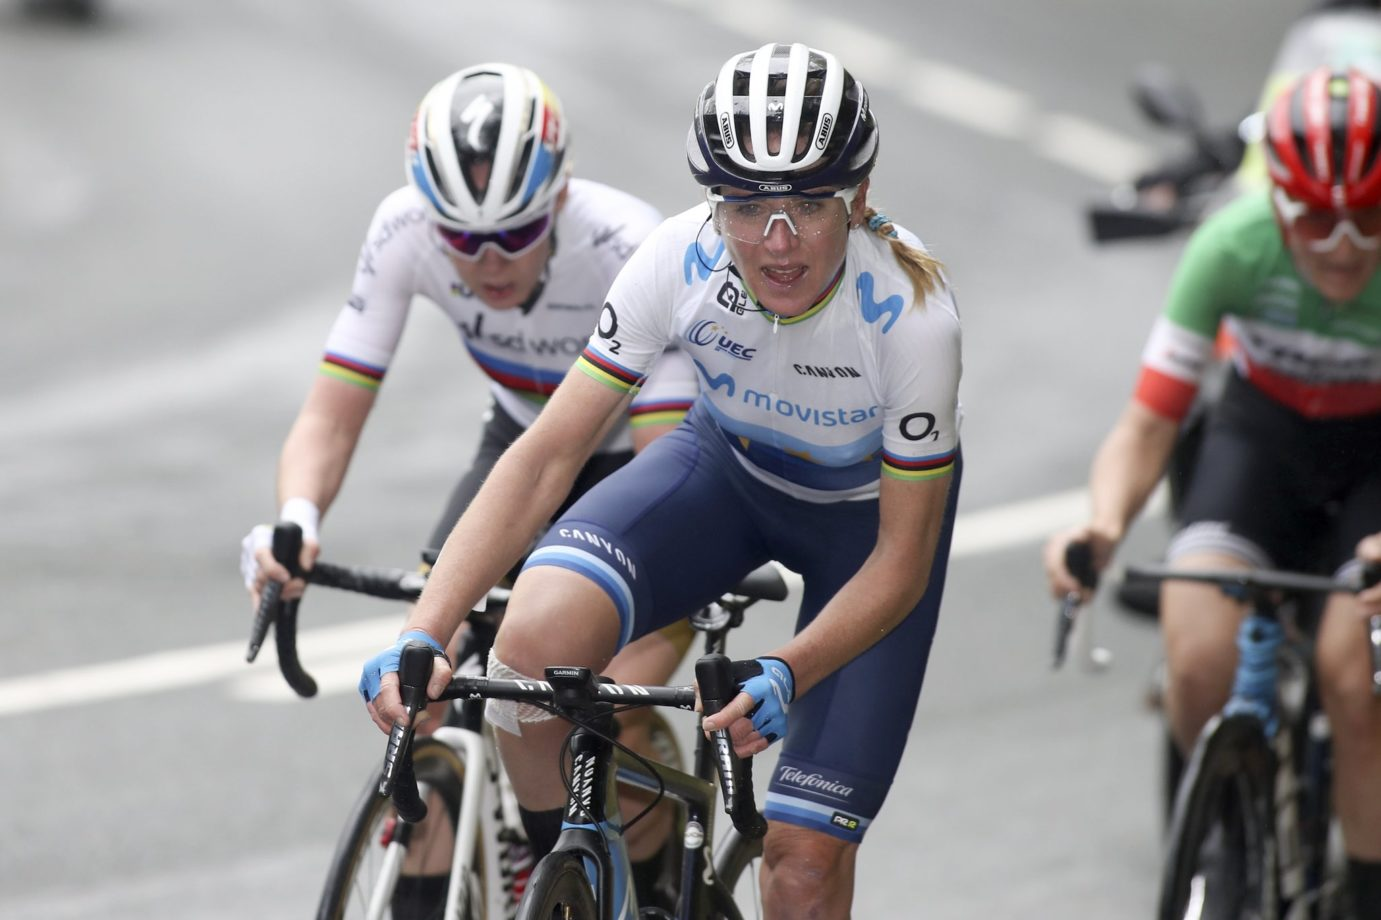 News' image'Van Vleuten no se baja del podio: 2ª en el GP Eibar en Arrate'